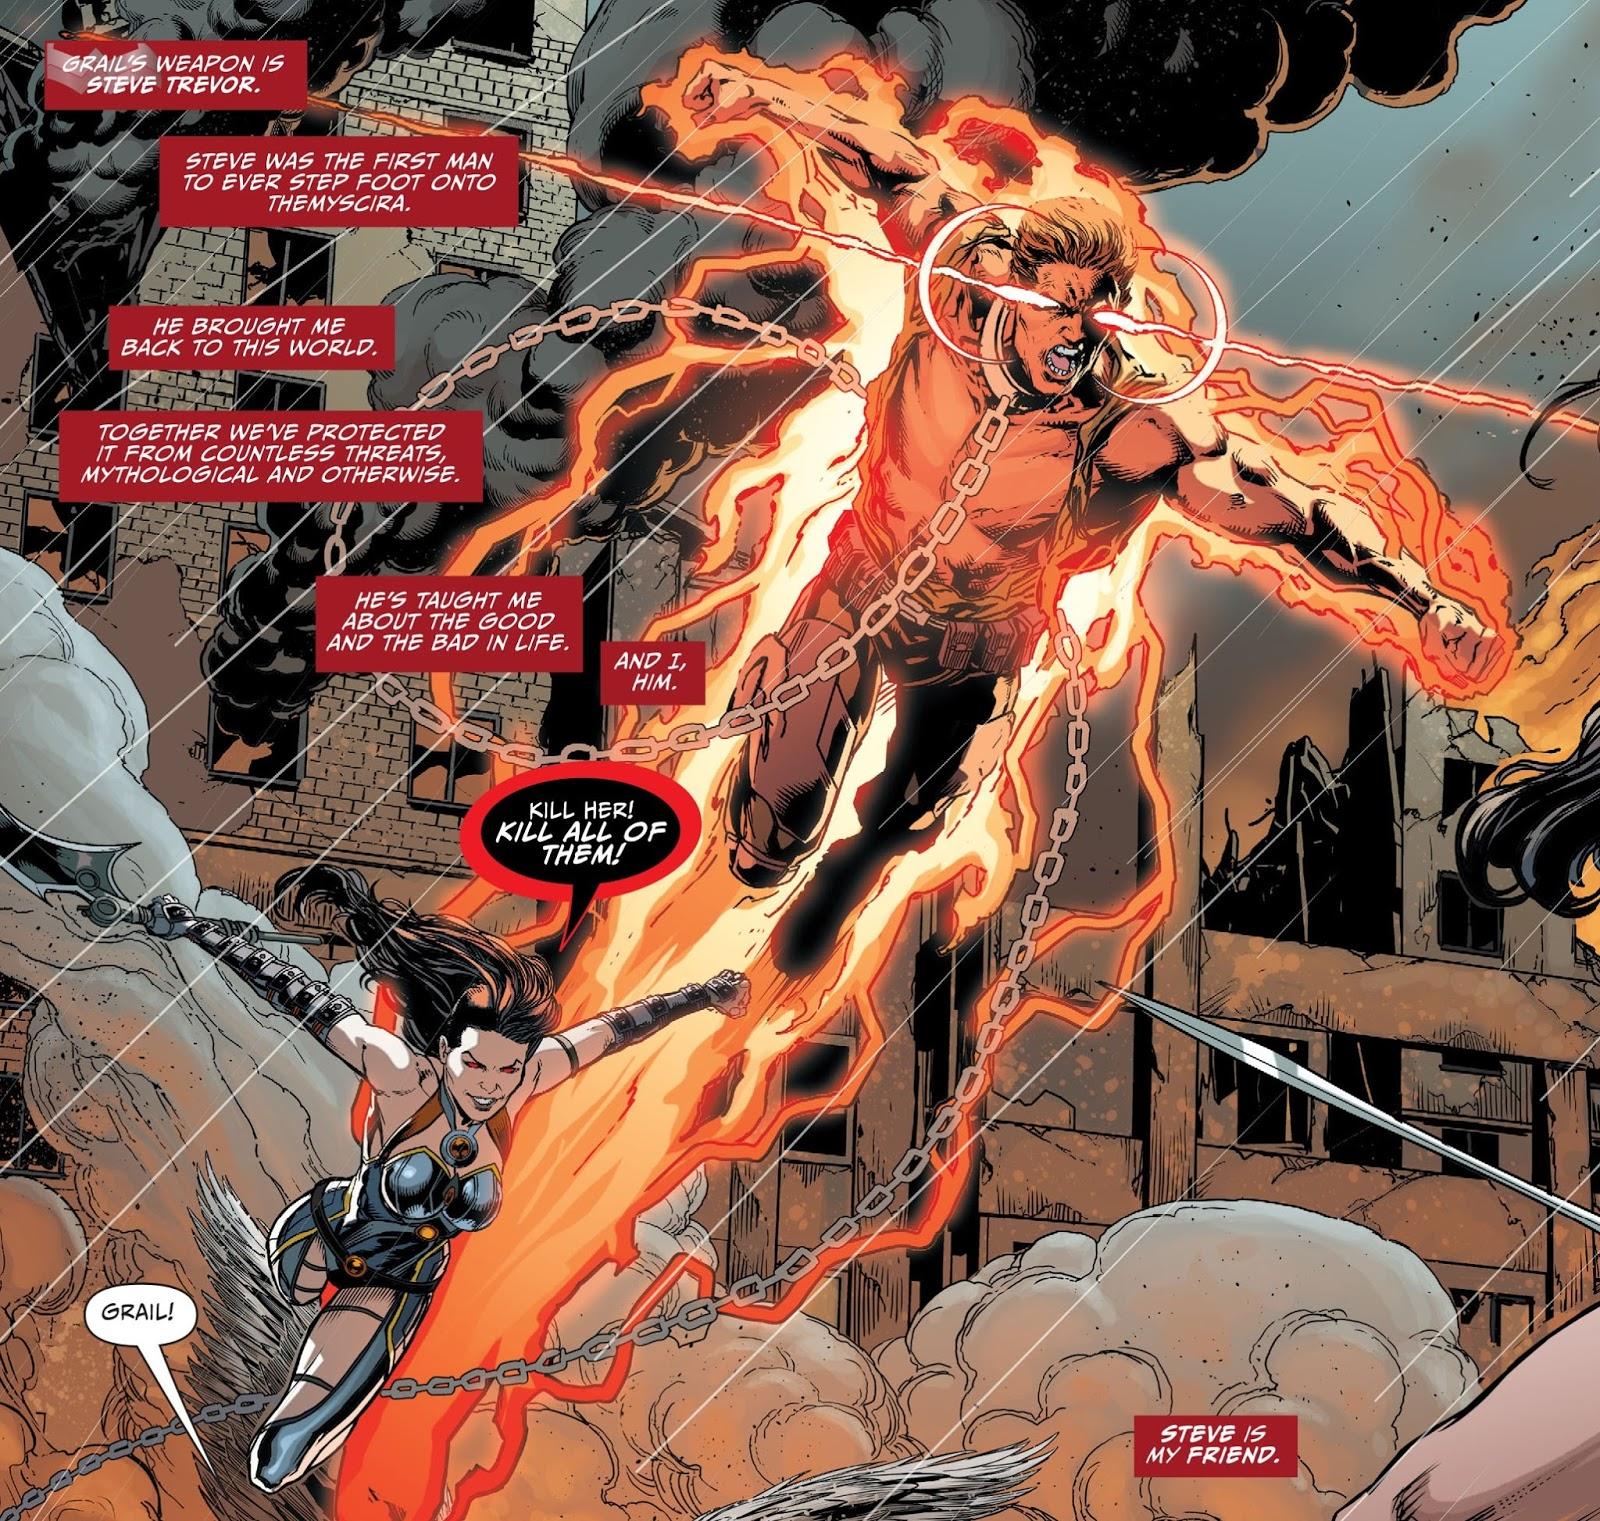 93469341a6 ... Justice League B: Anime Feet: Justice League Darkseid War: Grail